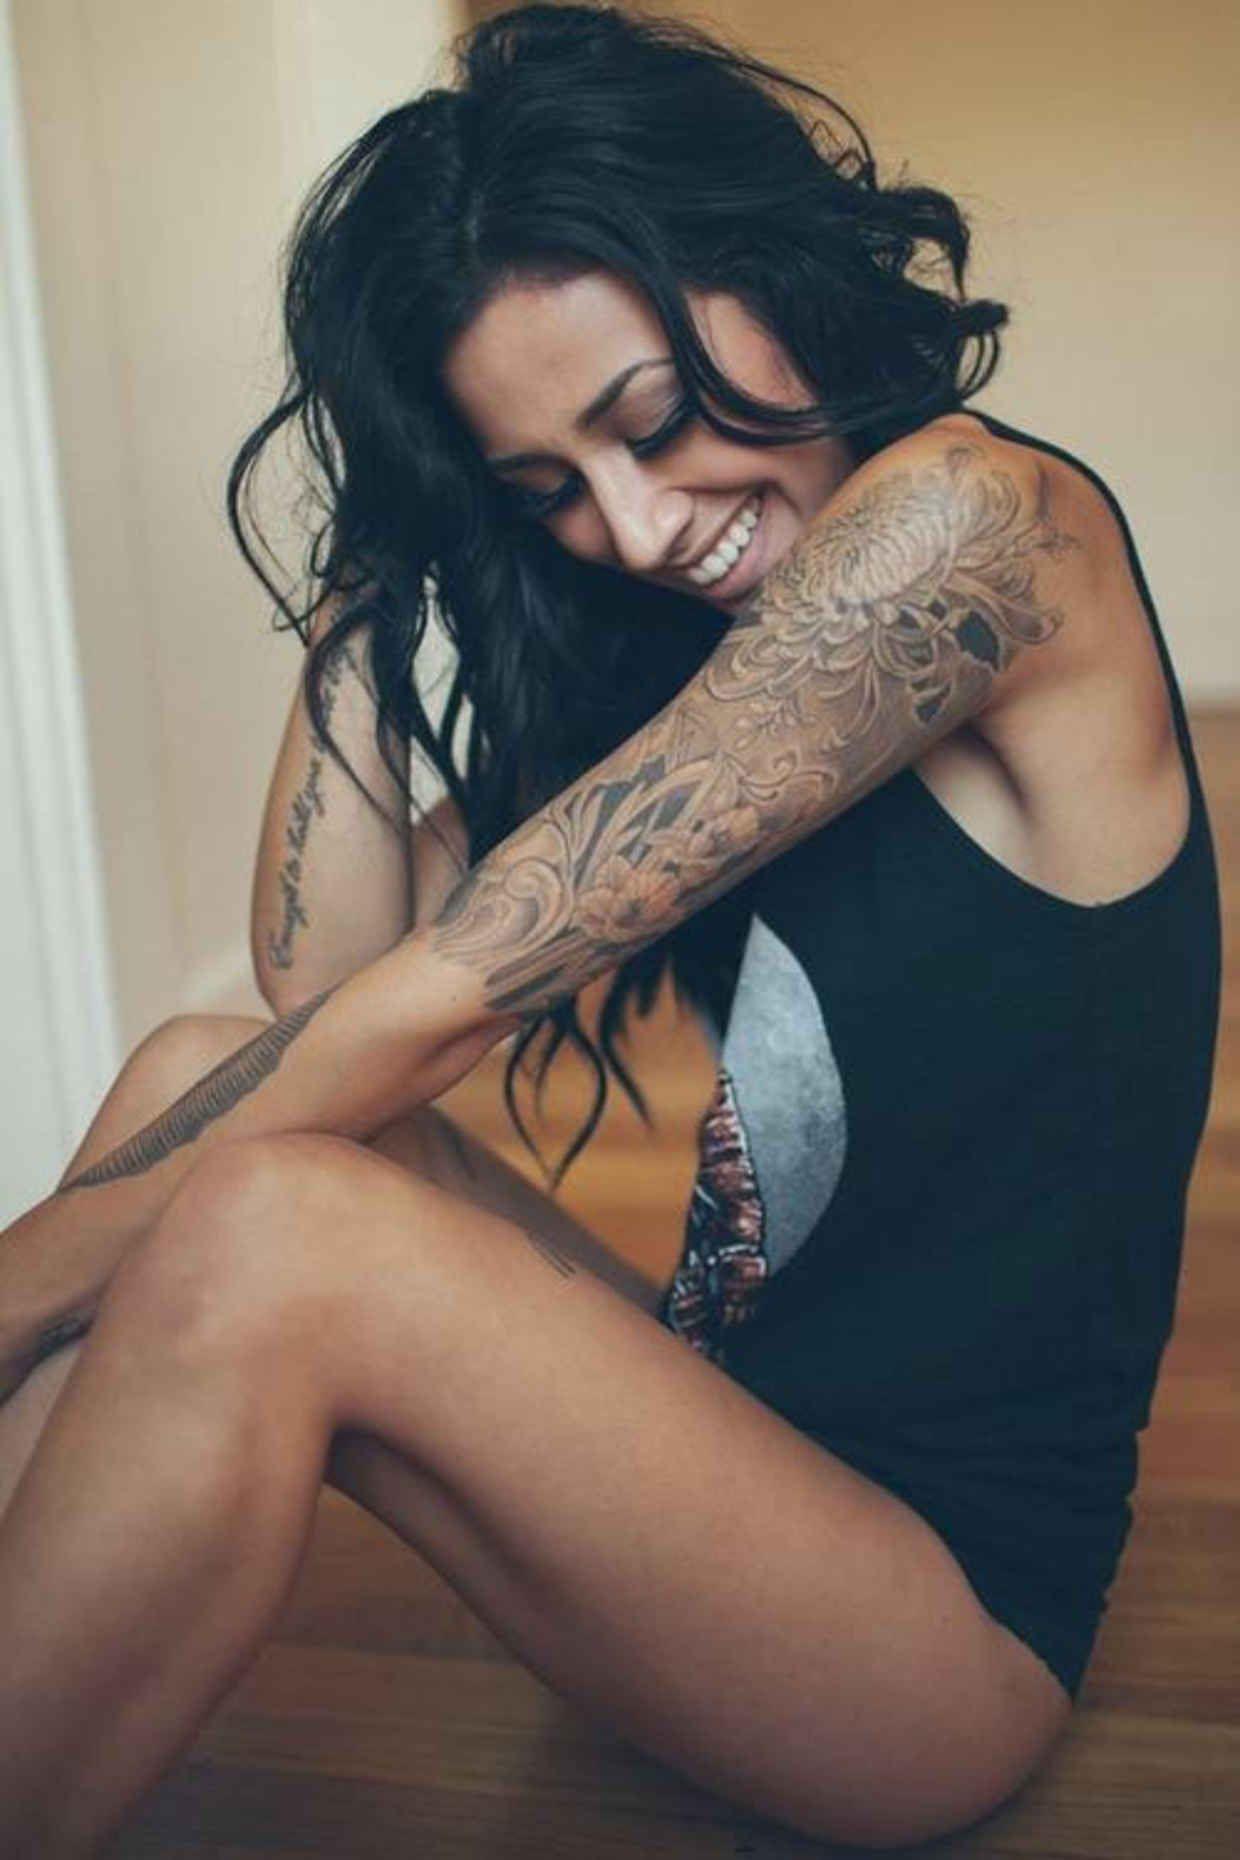 Pornstar with the sleeve tatoo